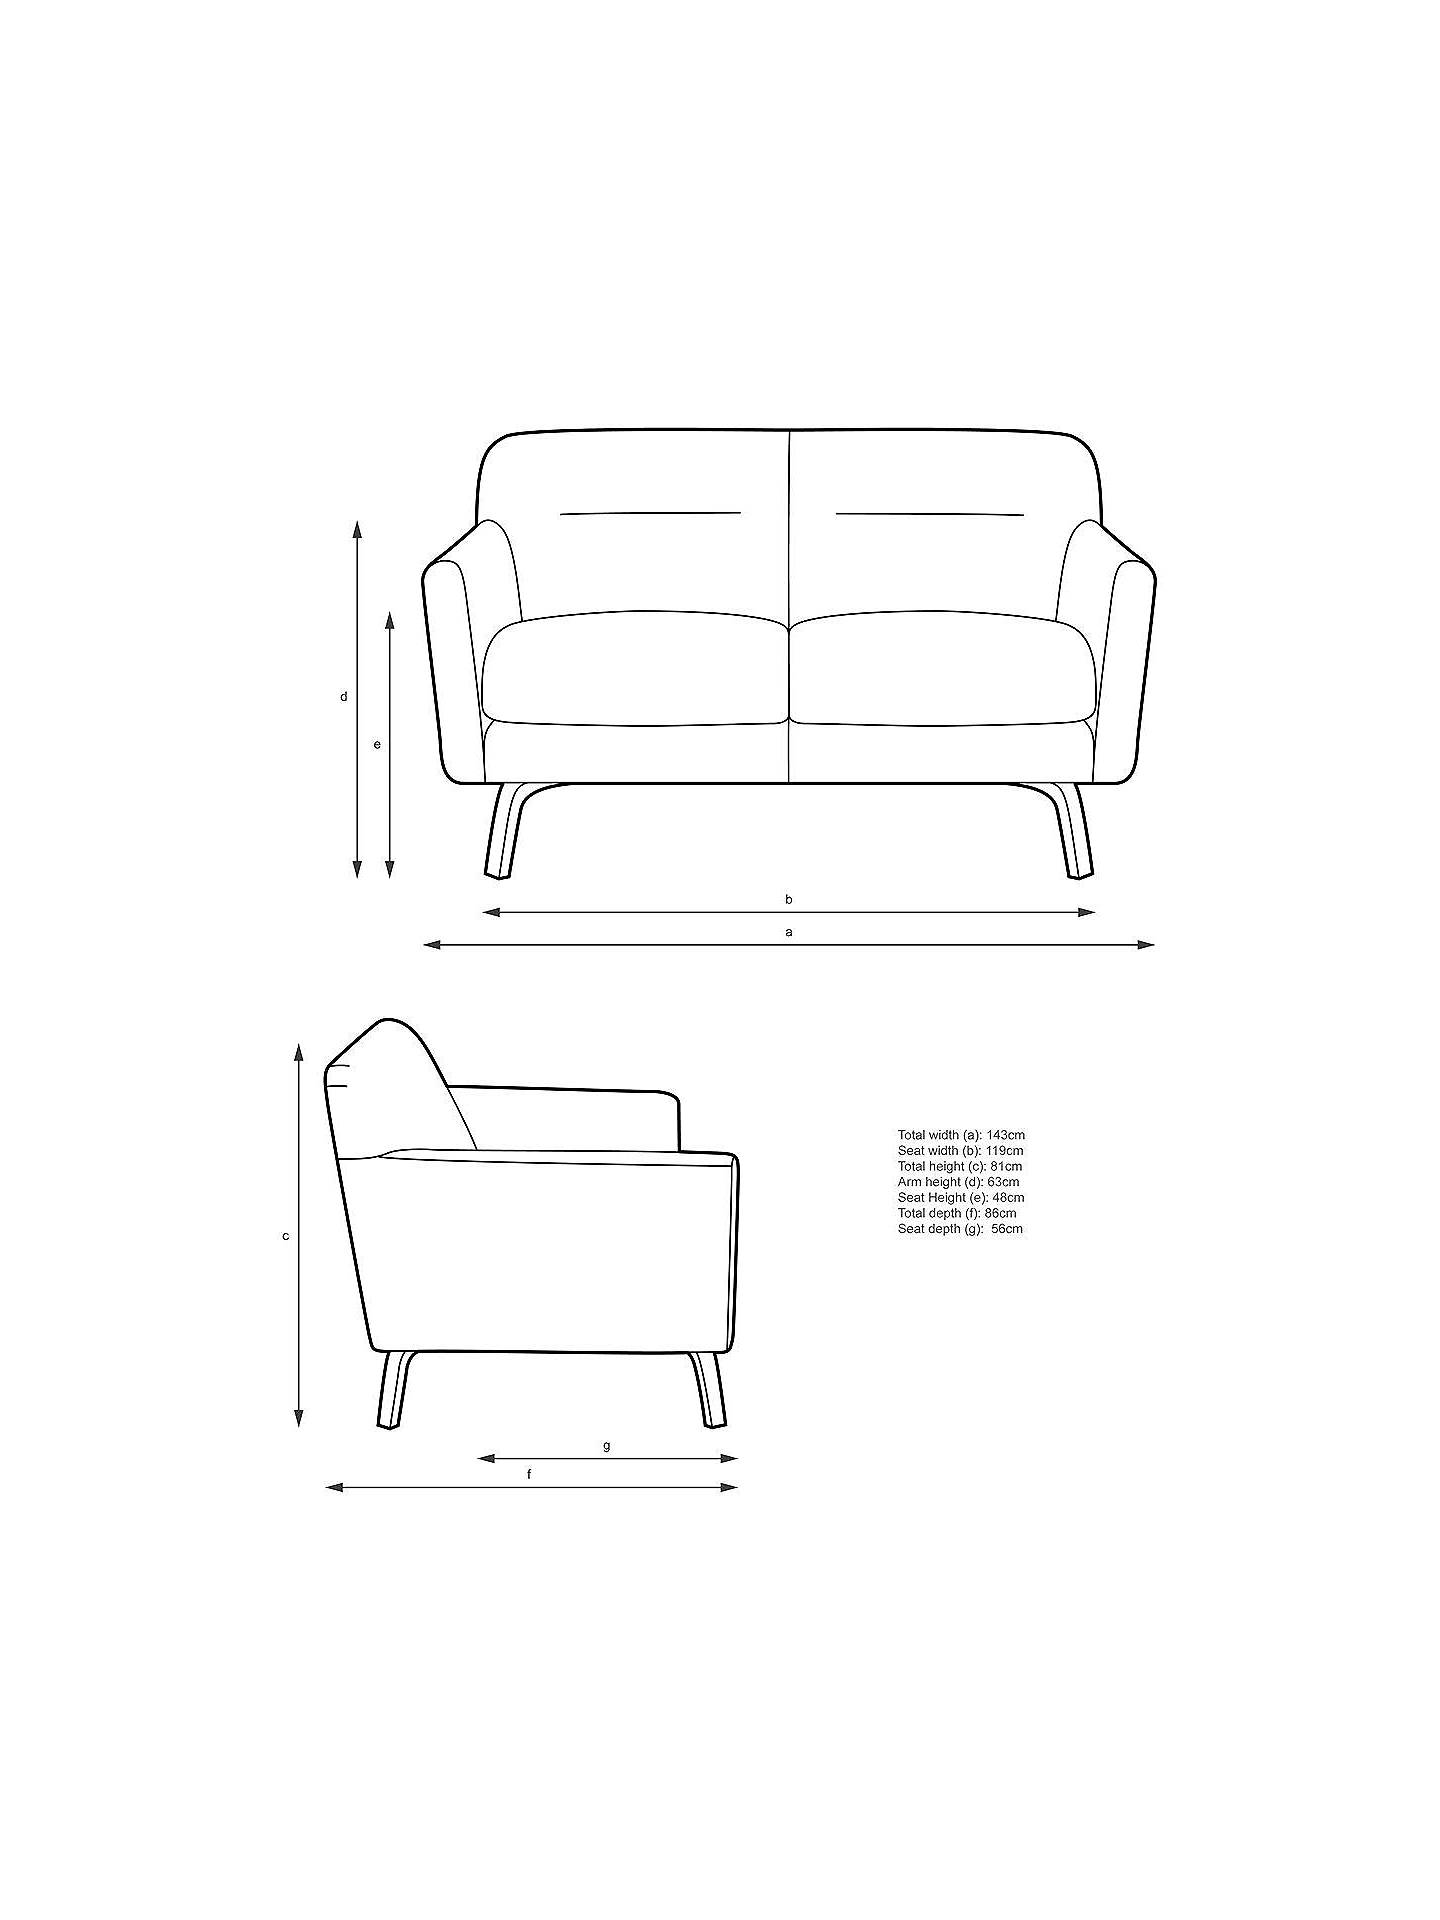 Fantastic House By John Lewis Archie Ii Small 2 Seater Sofa Light Leg Machost Co Dining Chair Design Ideas Machostcouk